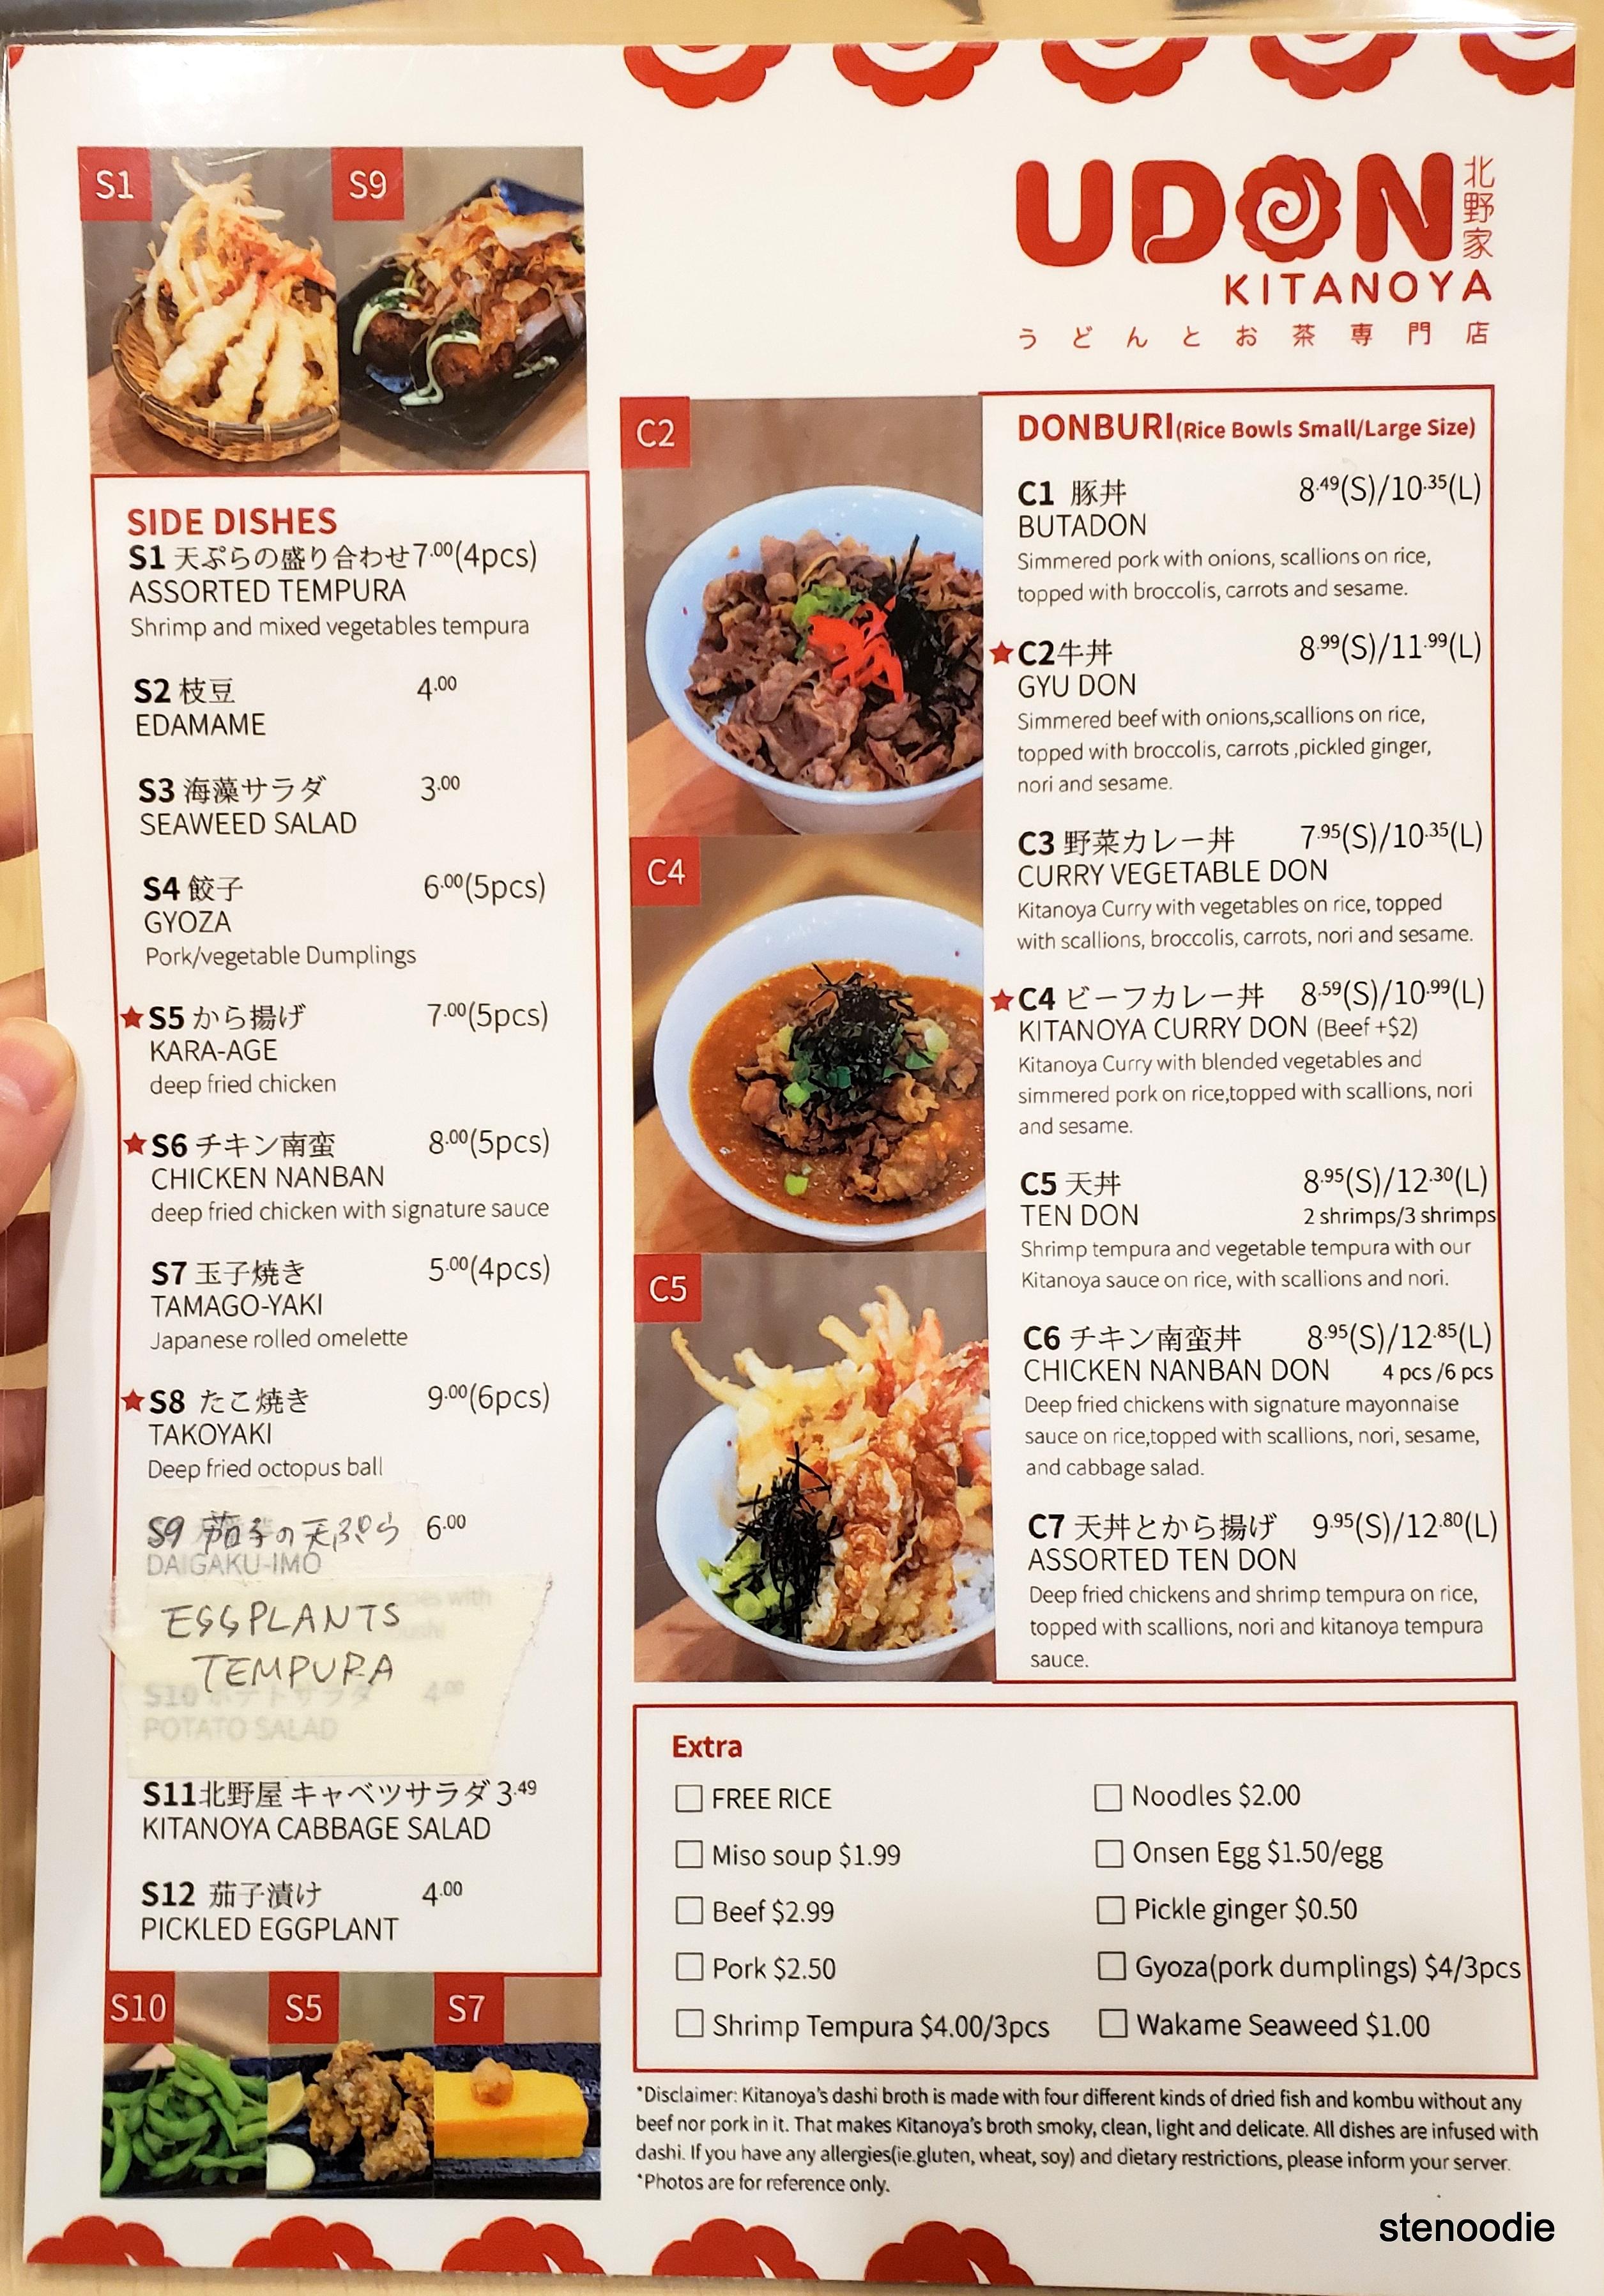 Udon Kitanoya menu and prices